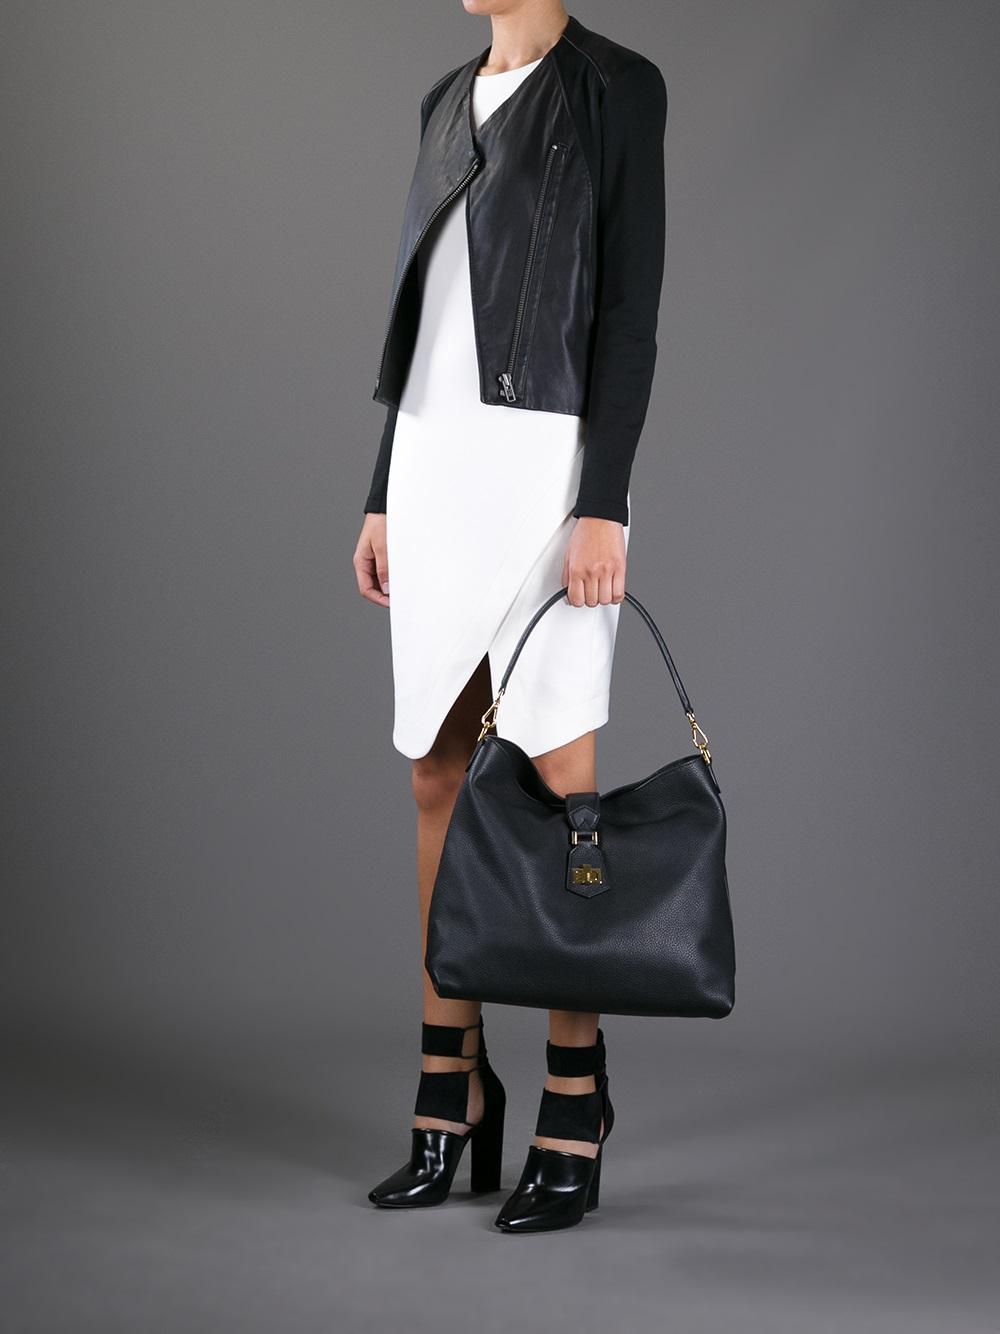 Fendi Classic Hobo Bag in Black | Lyst